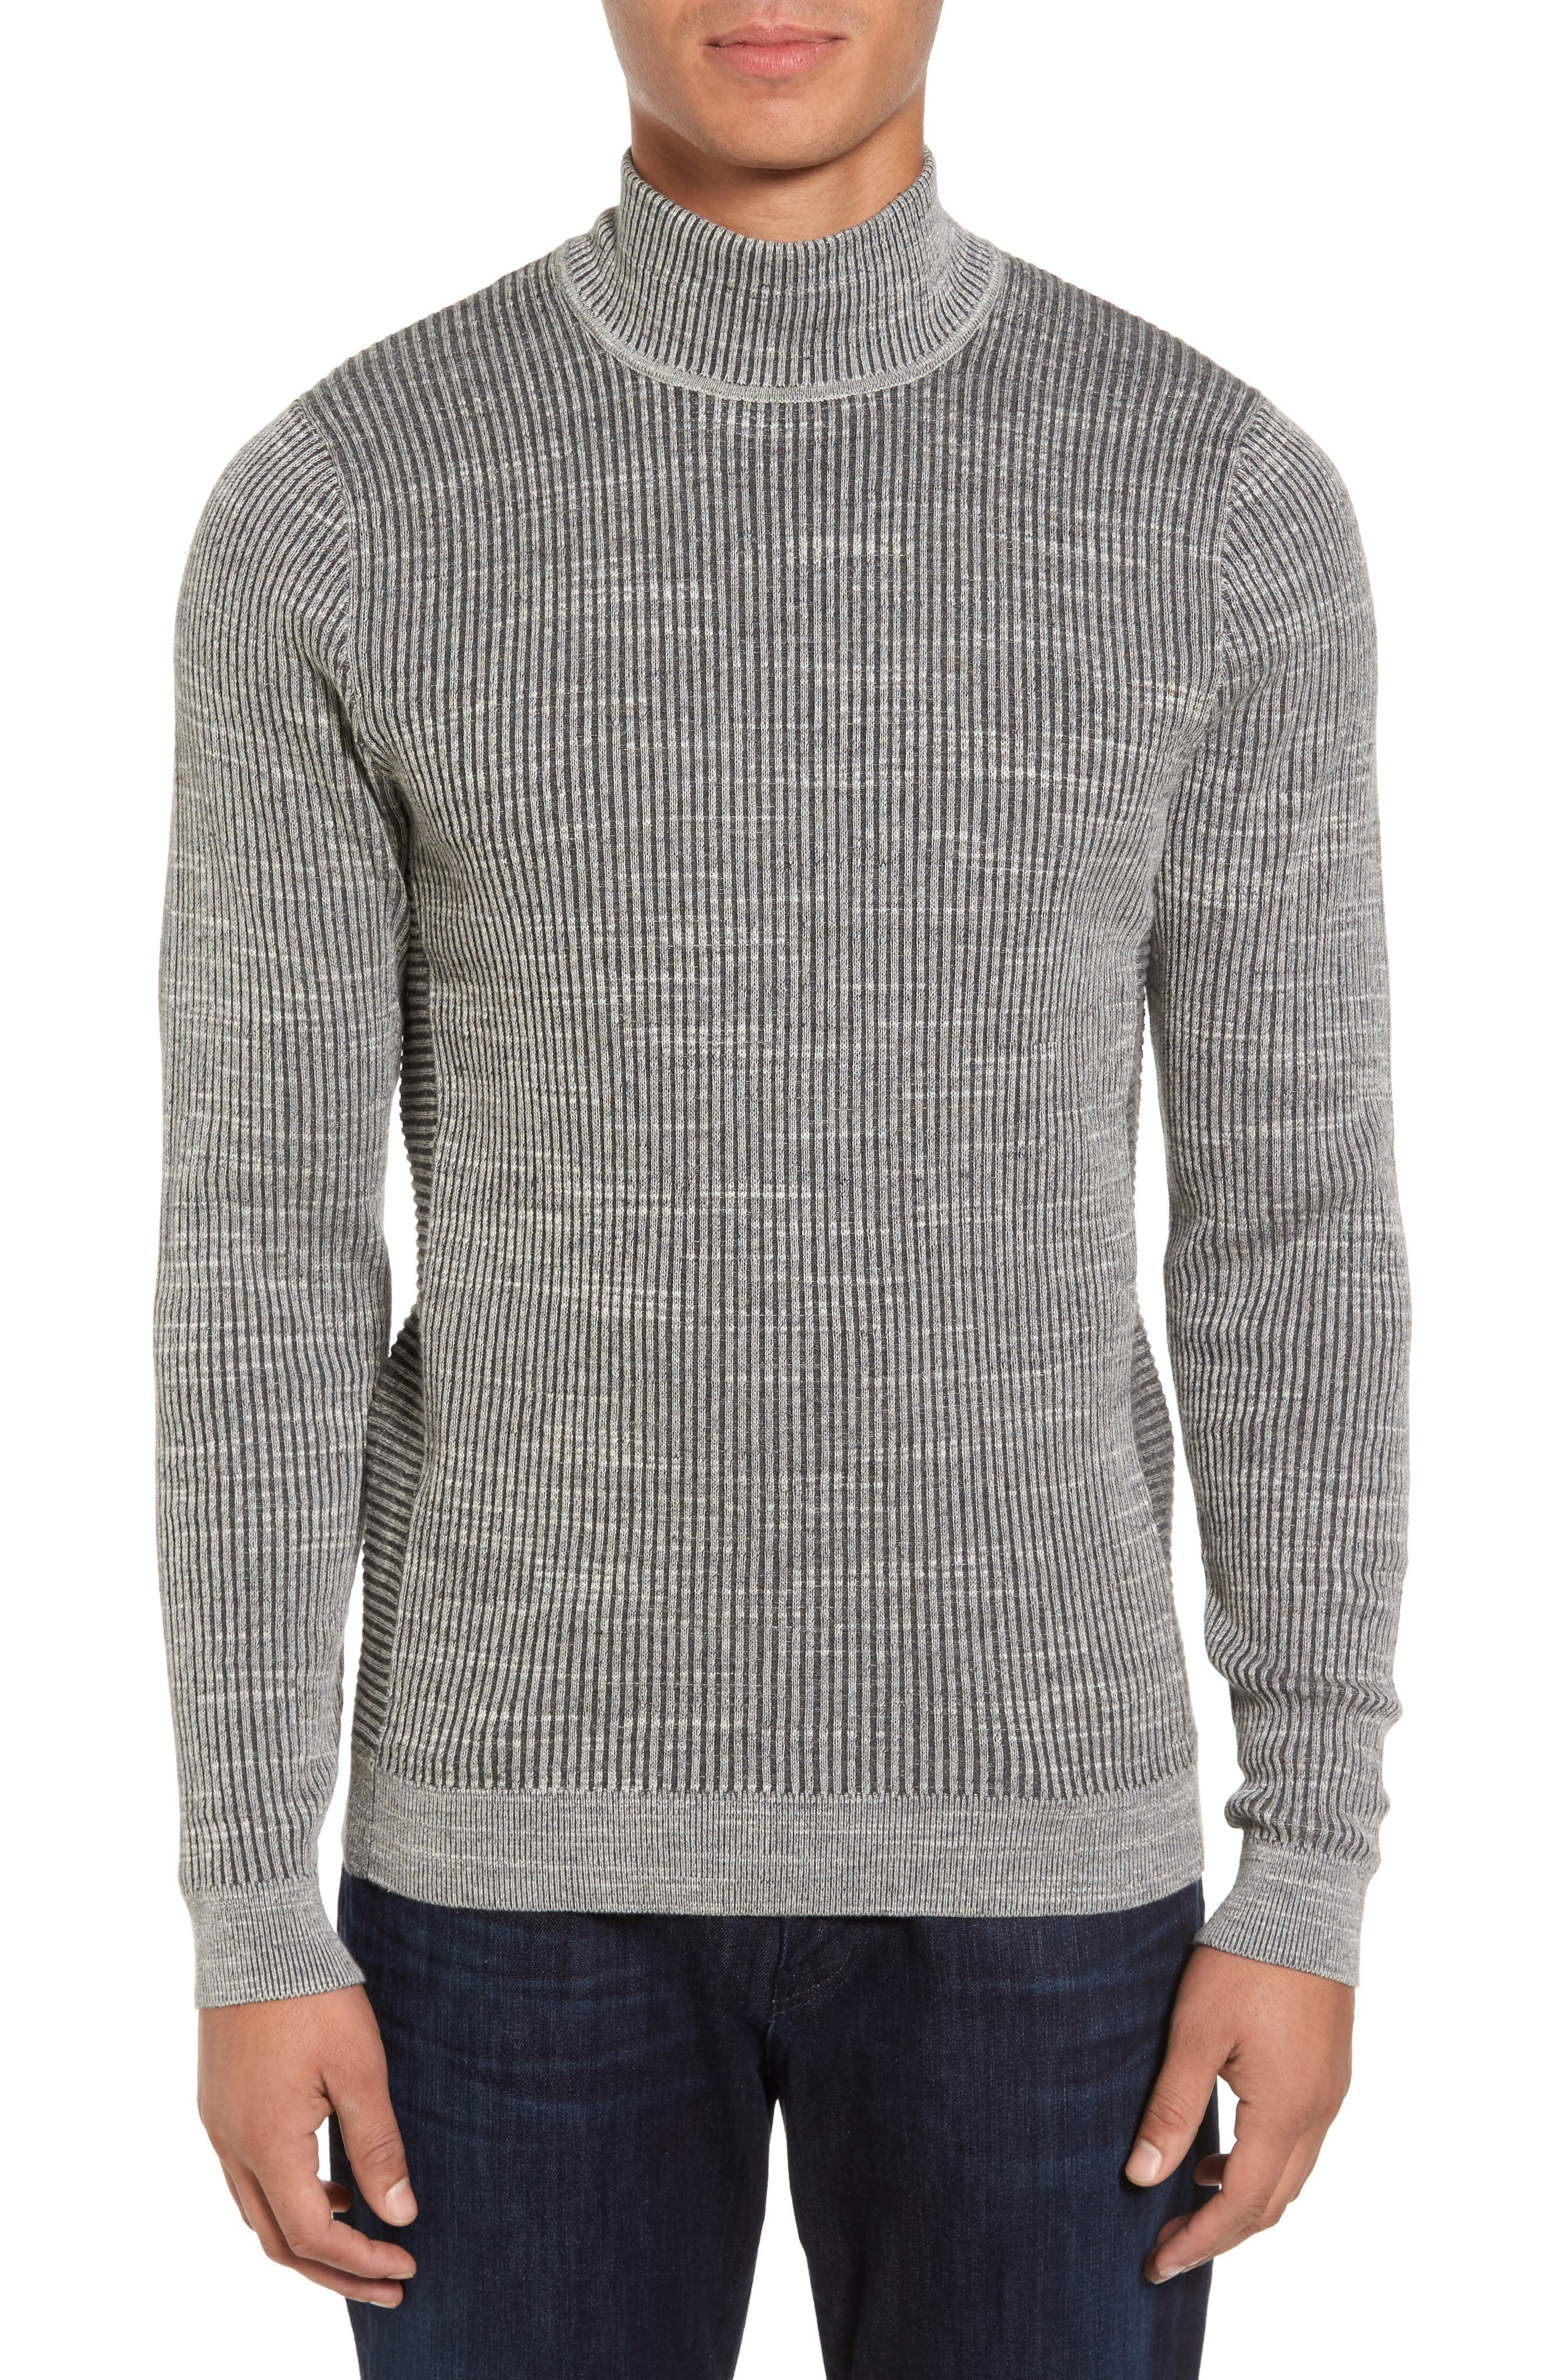 Mock Neck Sweater,                             Main thumbnail 1, color,                             Grey Dark Charcoal